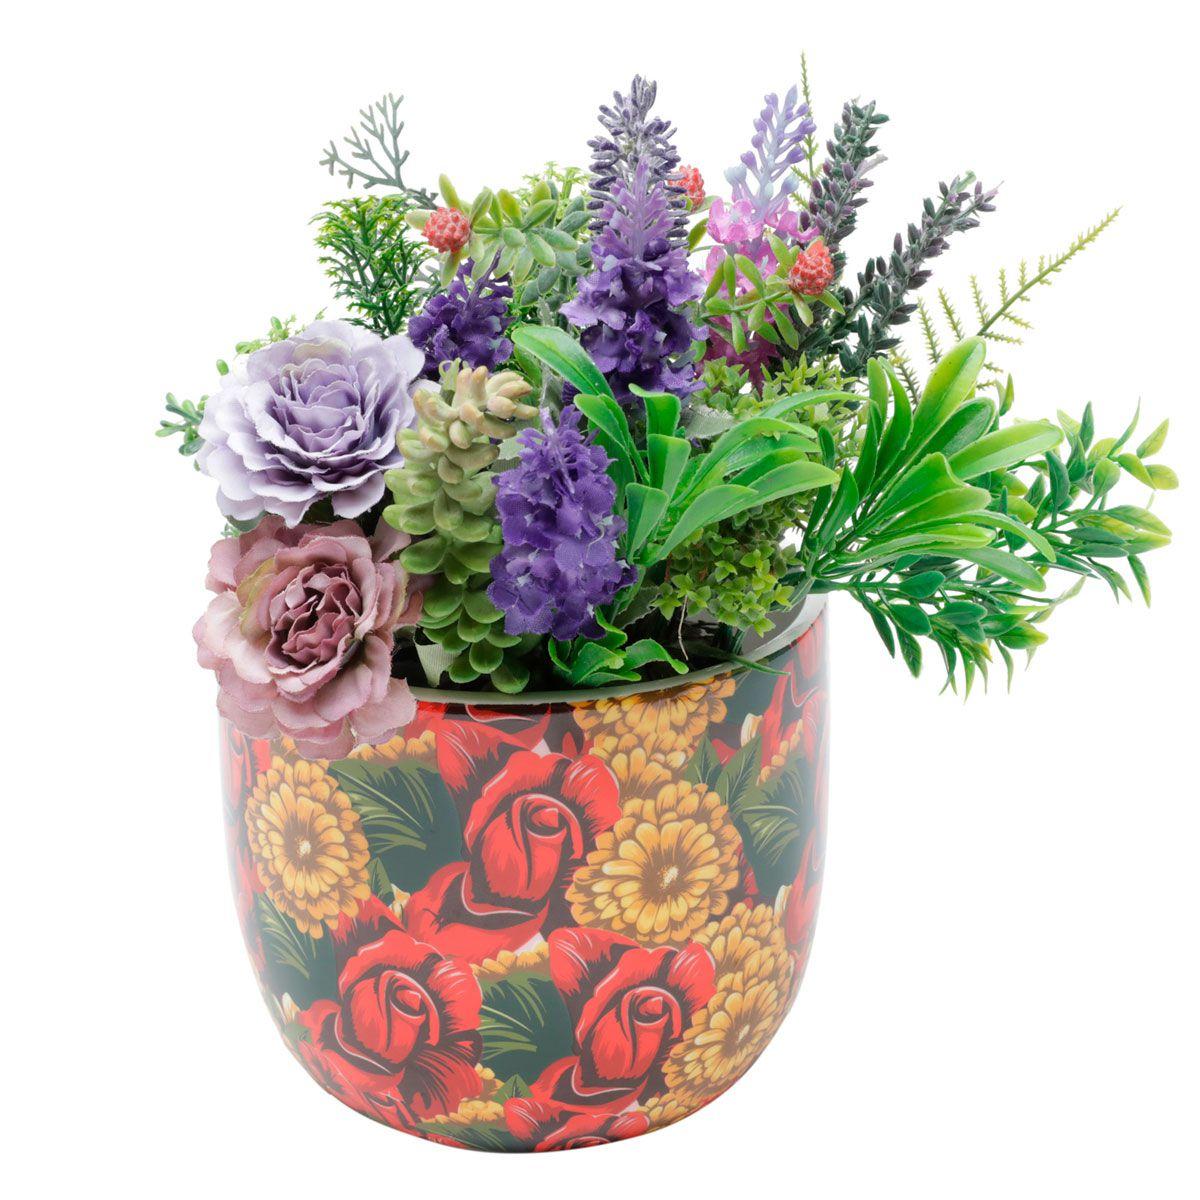 Cachepot Vaso Decorativo de Cerâmica Frida Kahlo Yellow Flower